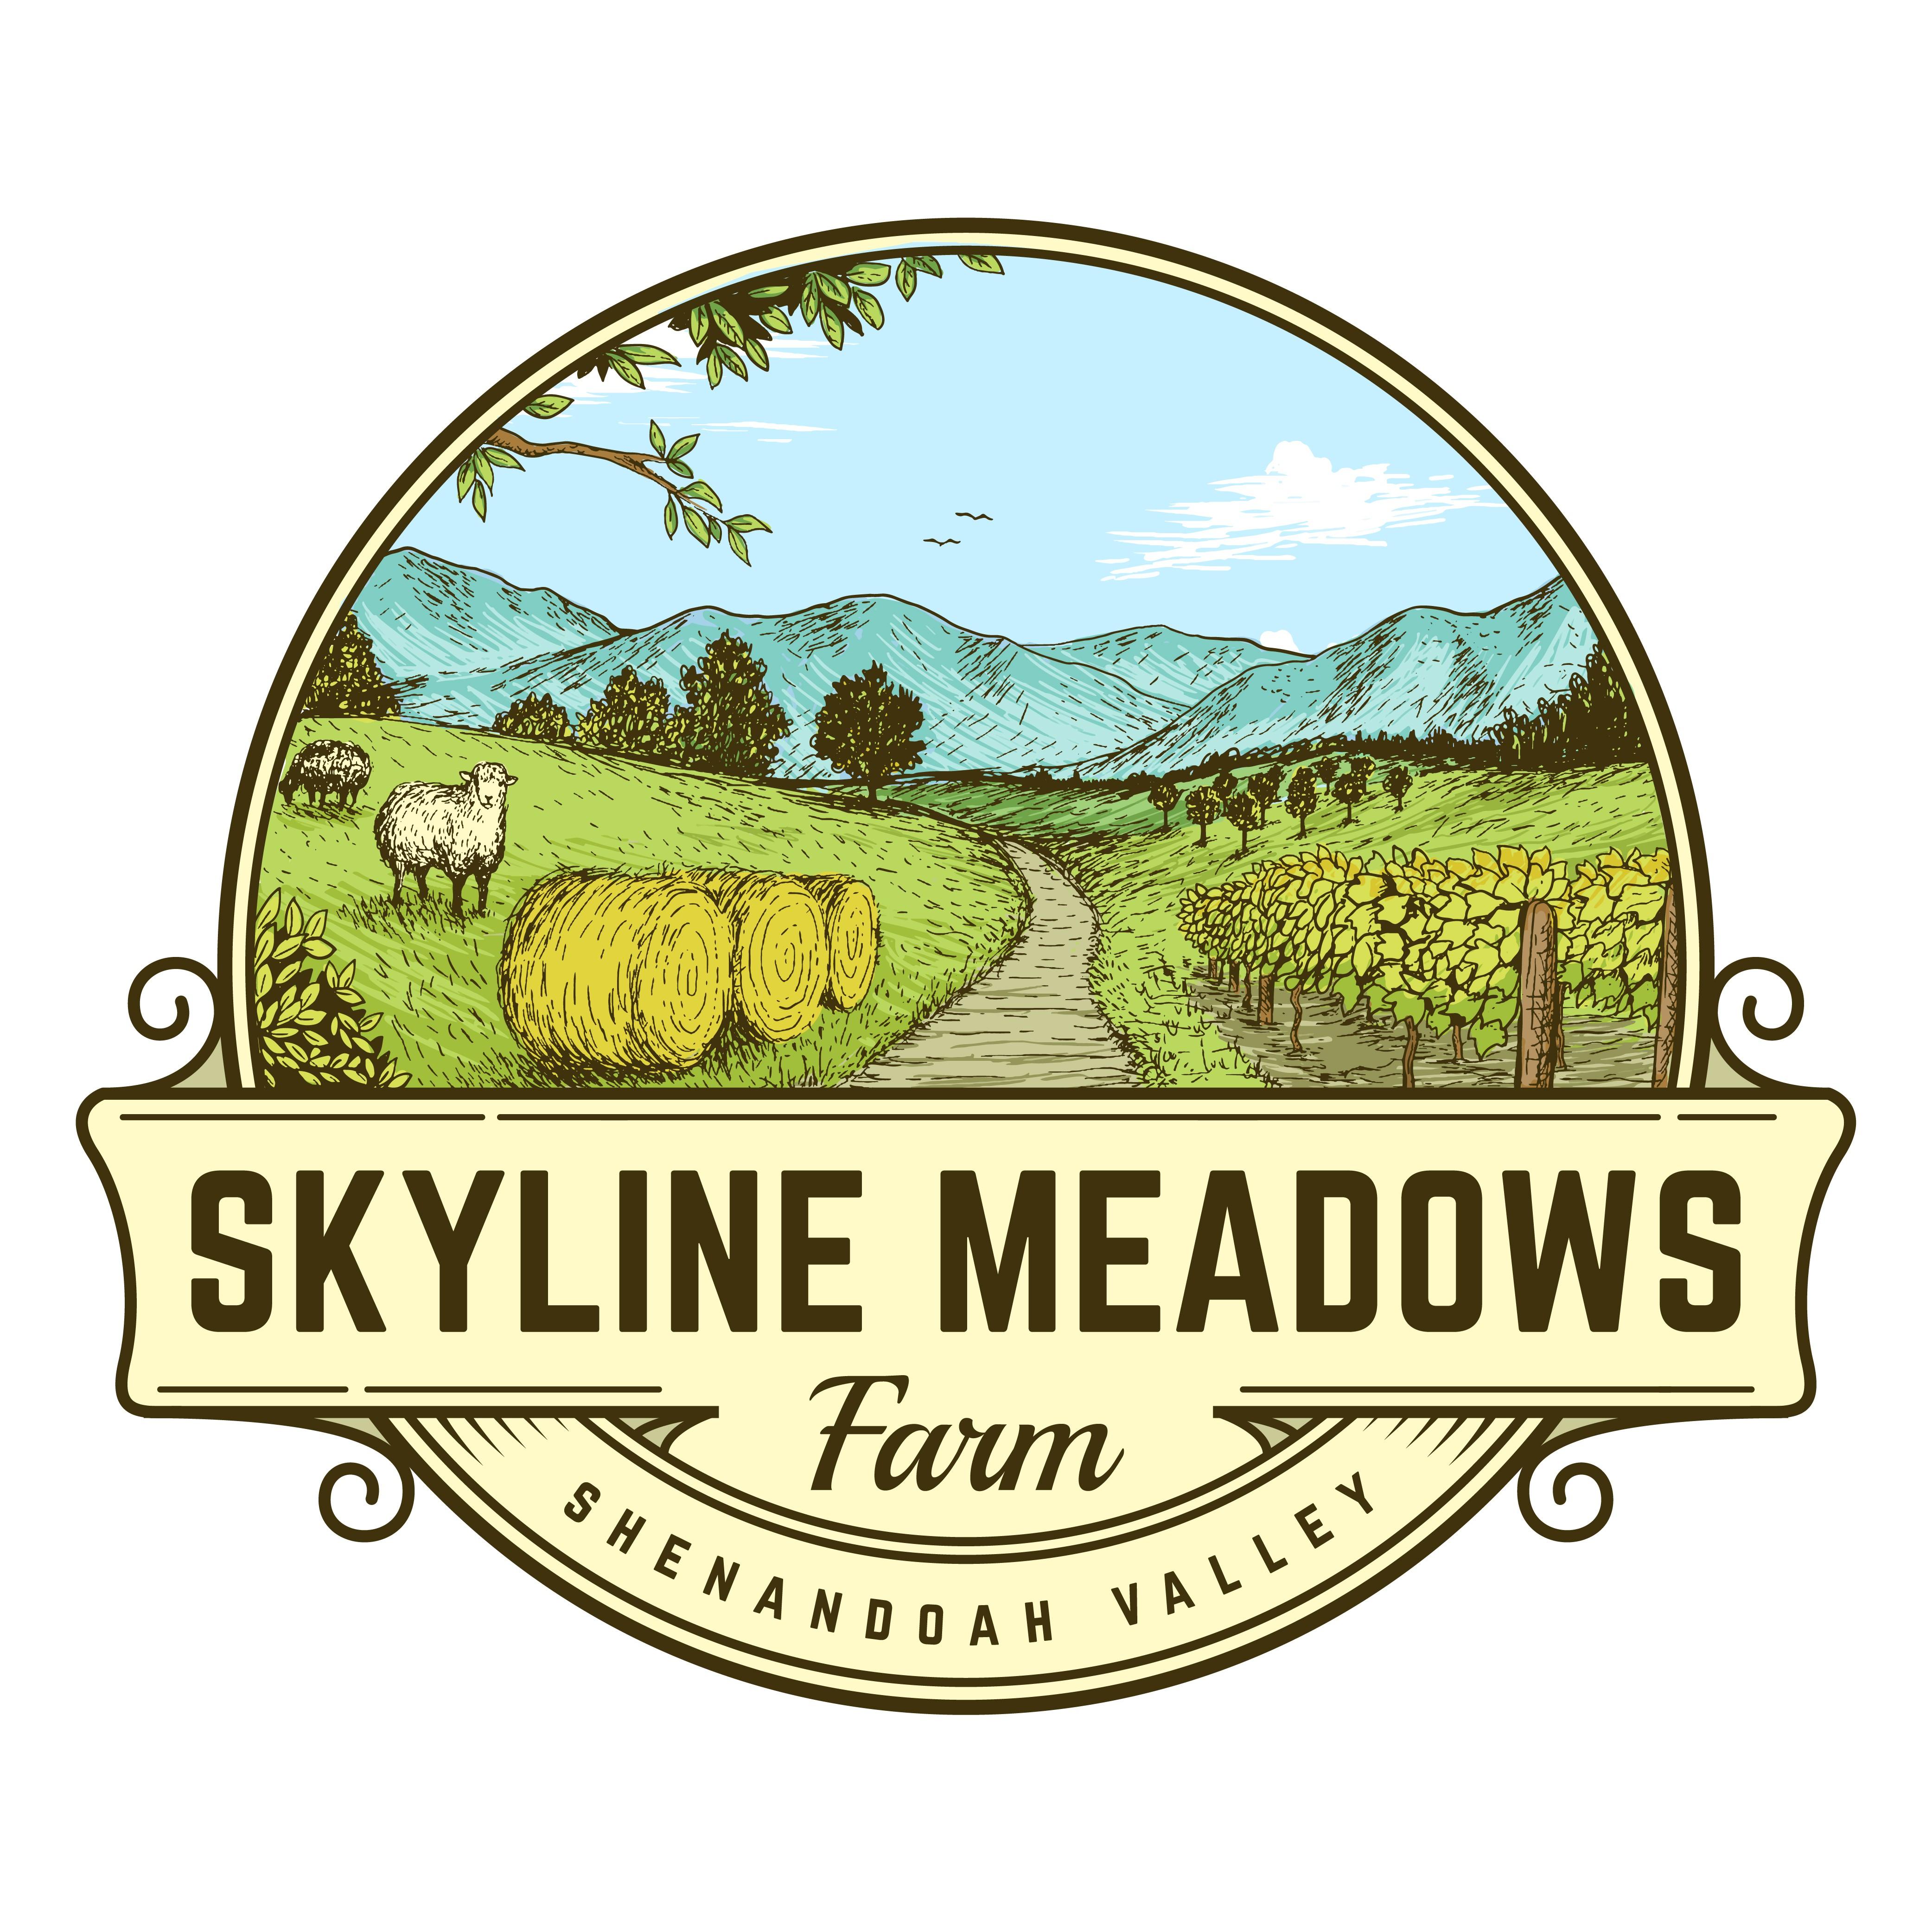 Skyline Meadows Farm - Farming Out Our Logo!